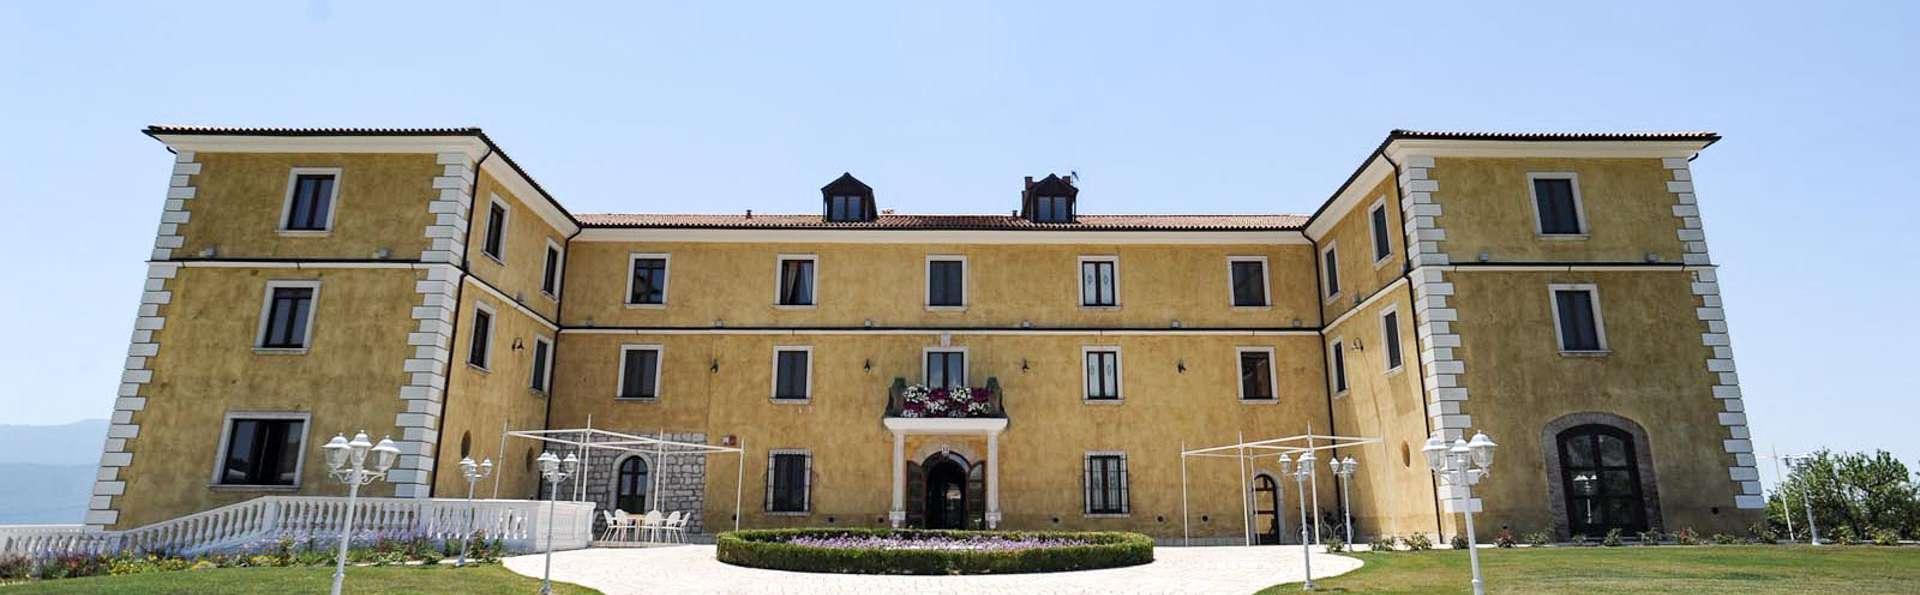 Eliceto Resort & Spa - EDIT_FRONT_02.jpg